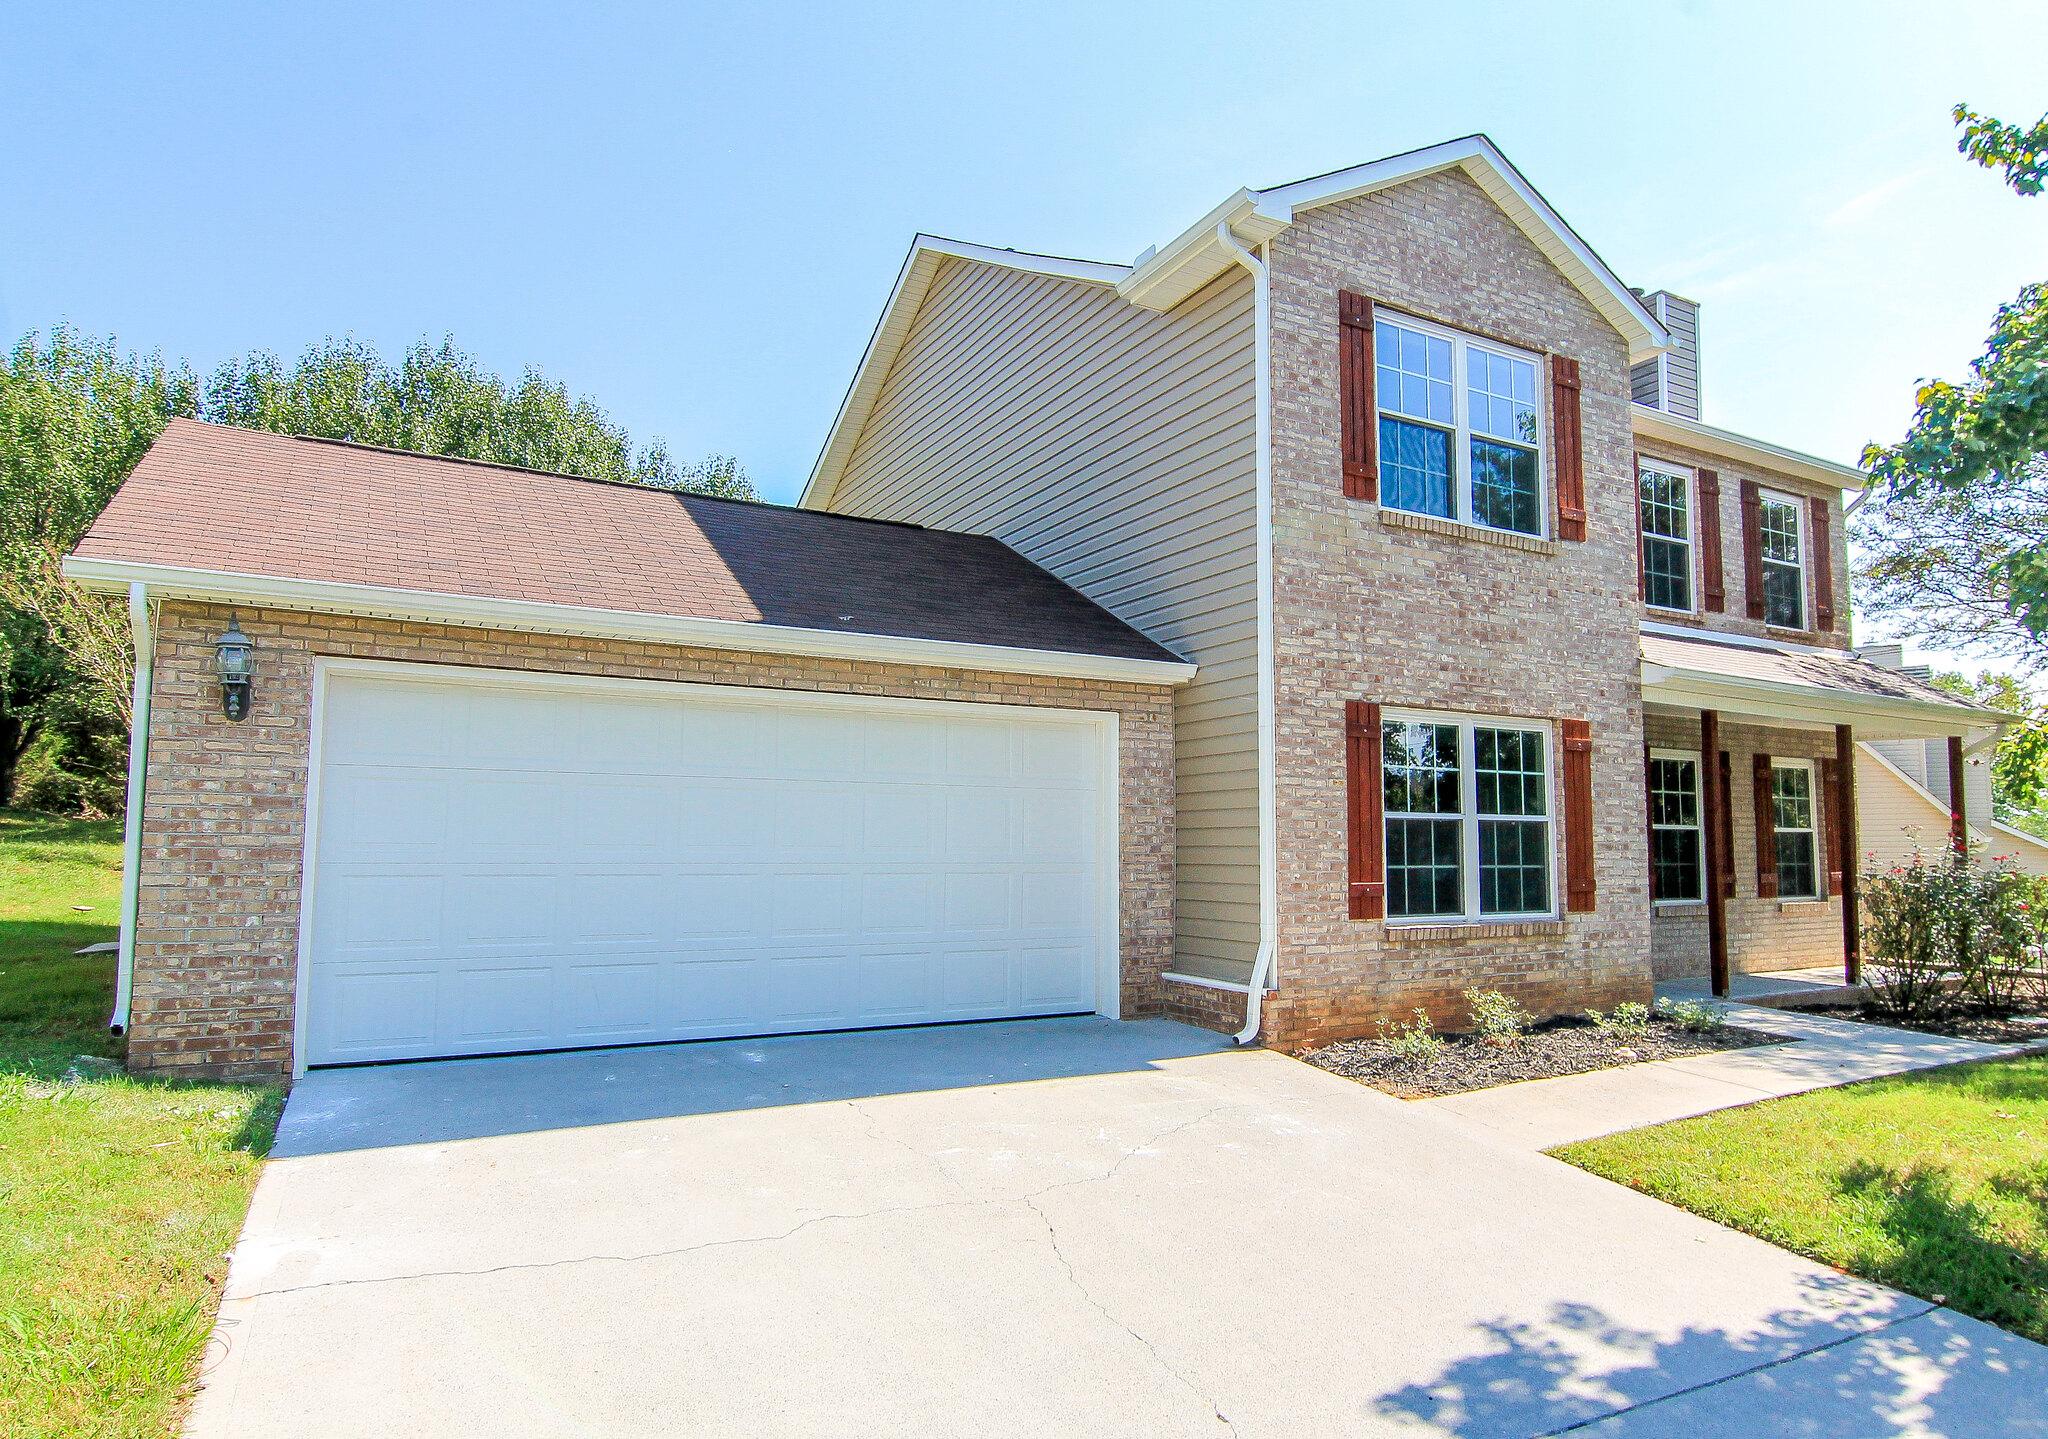 1806 Poplar Hill Rd, Knoxville, TN 37922